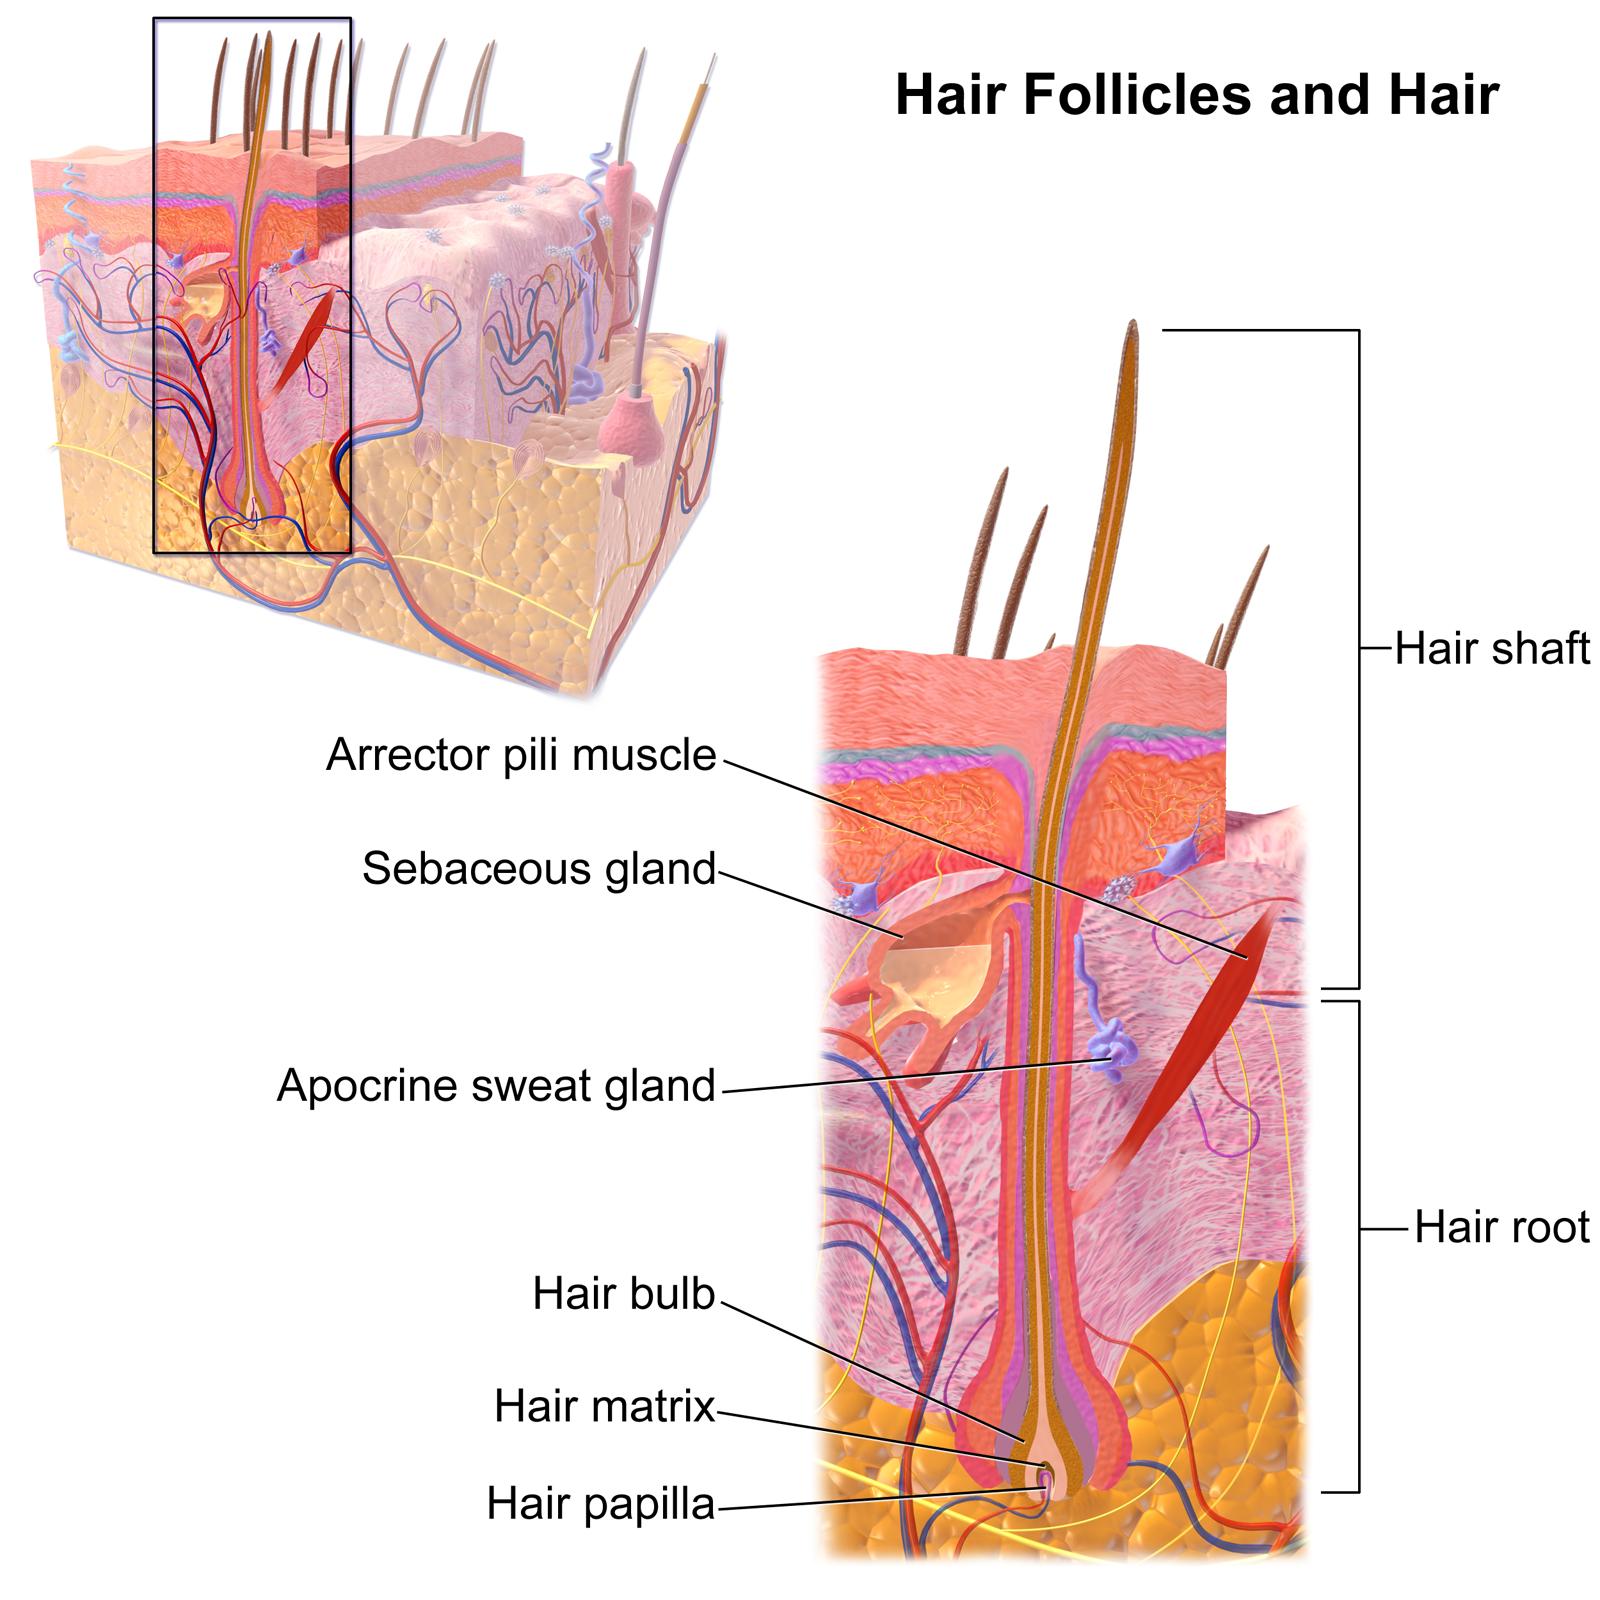 Blausen_0438_HairFollicleAnatomy_02.png